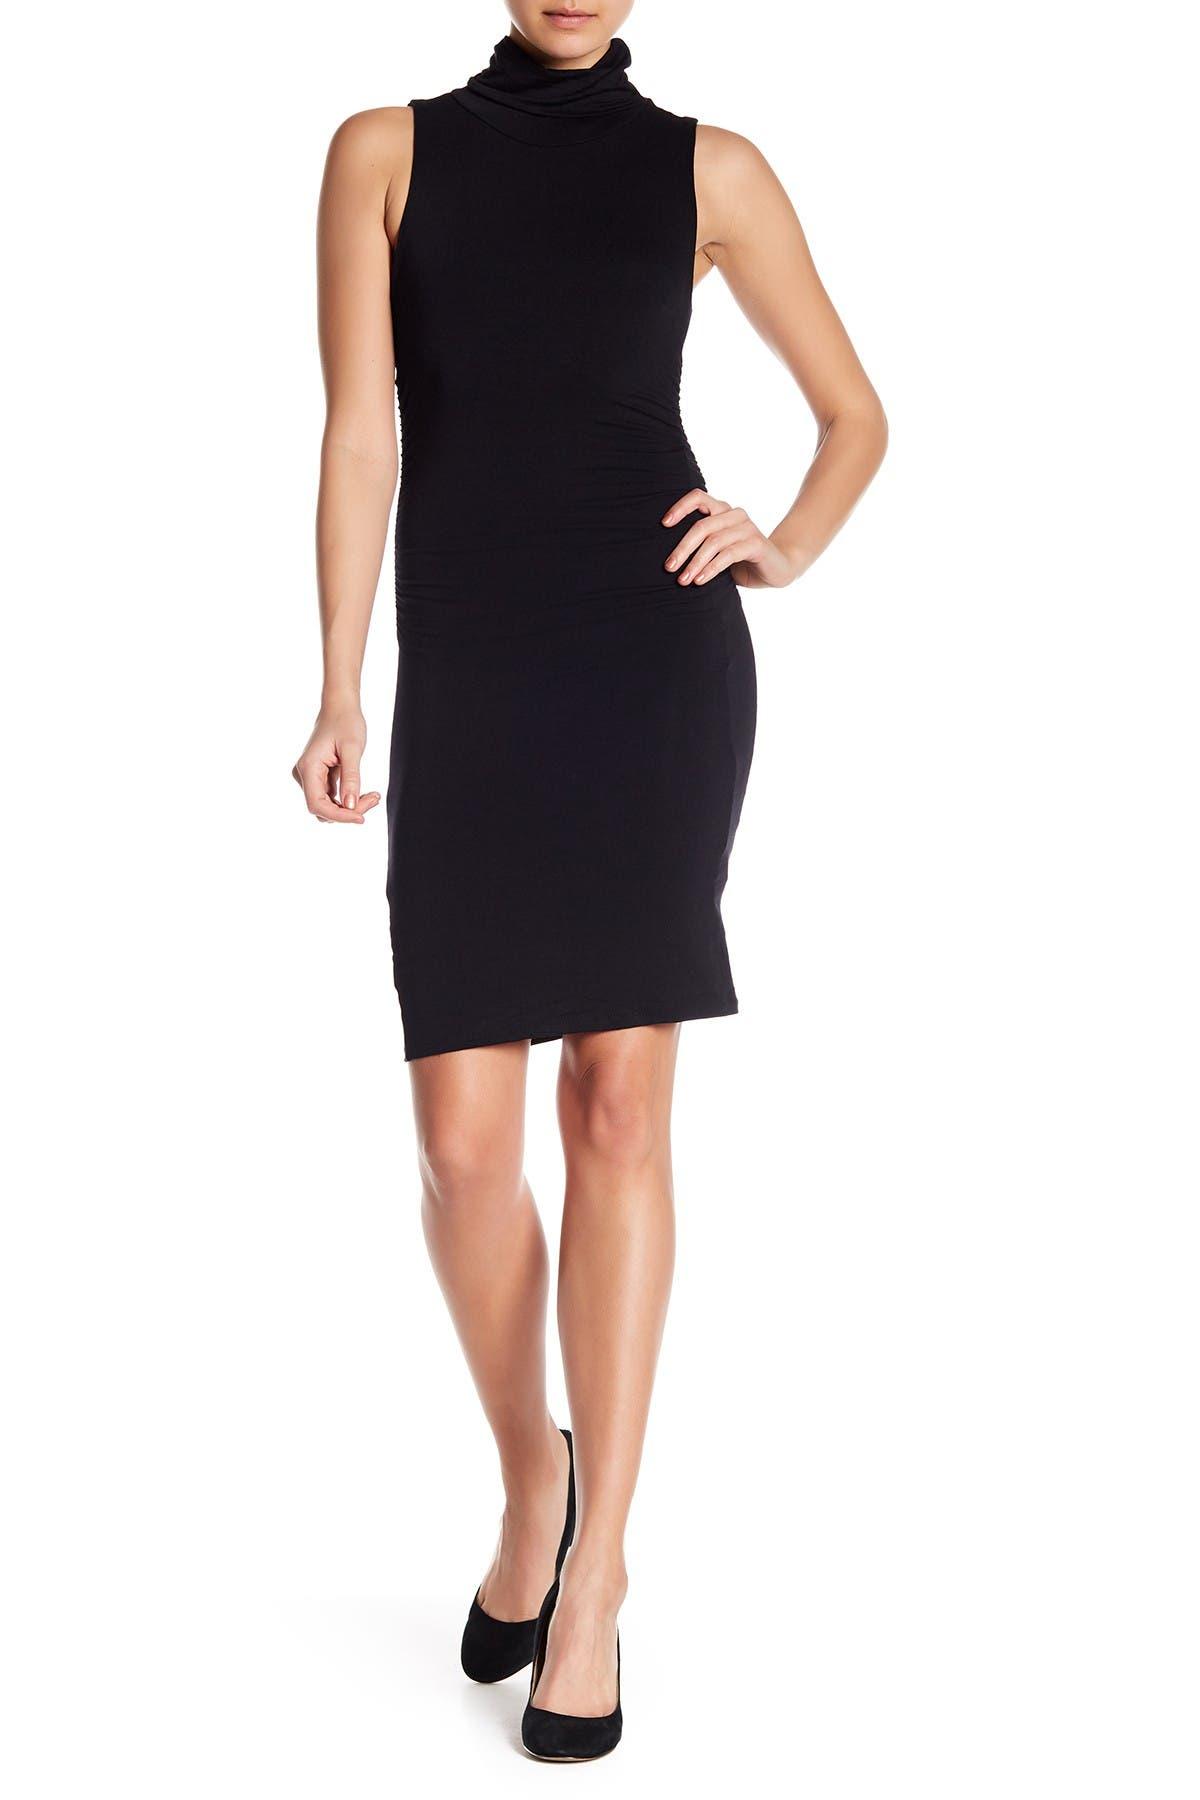 Image of Velvet Torch Ruched Sleeveless Turtleneck Dress